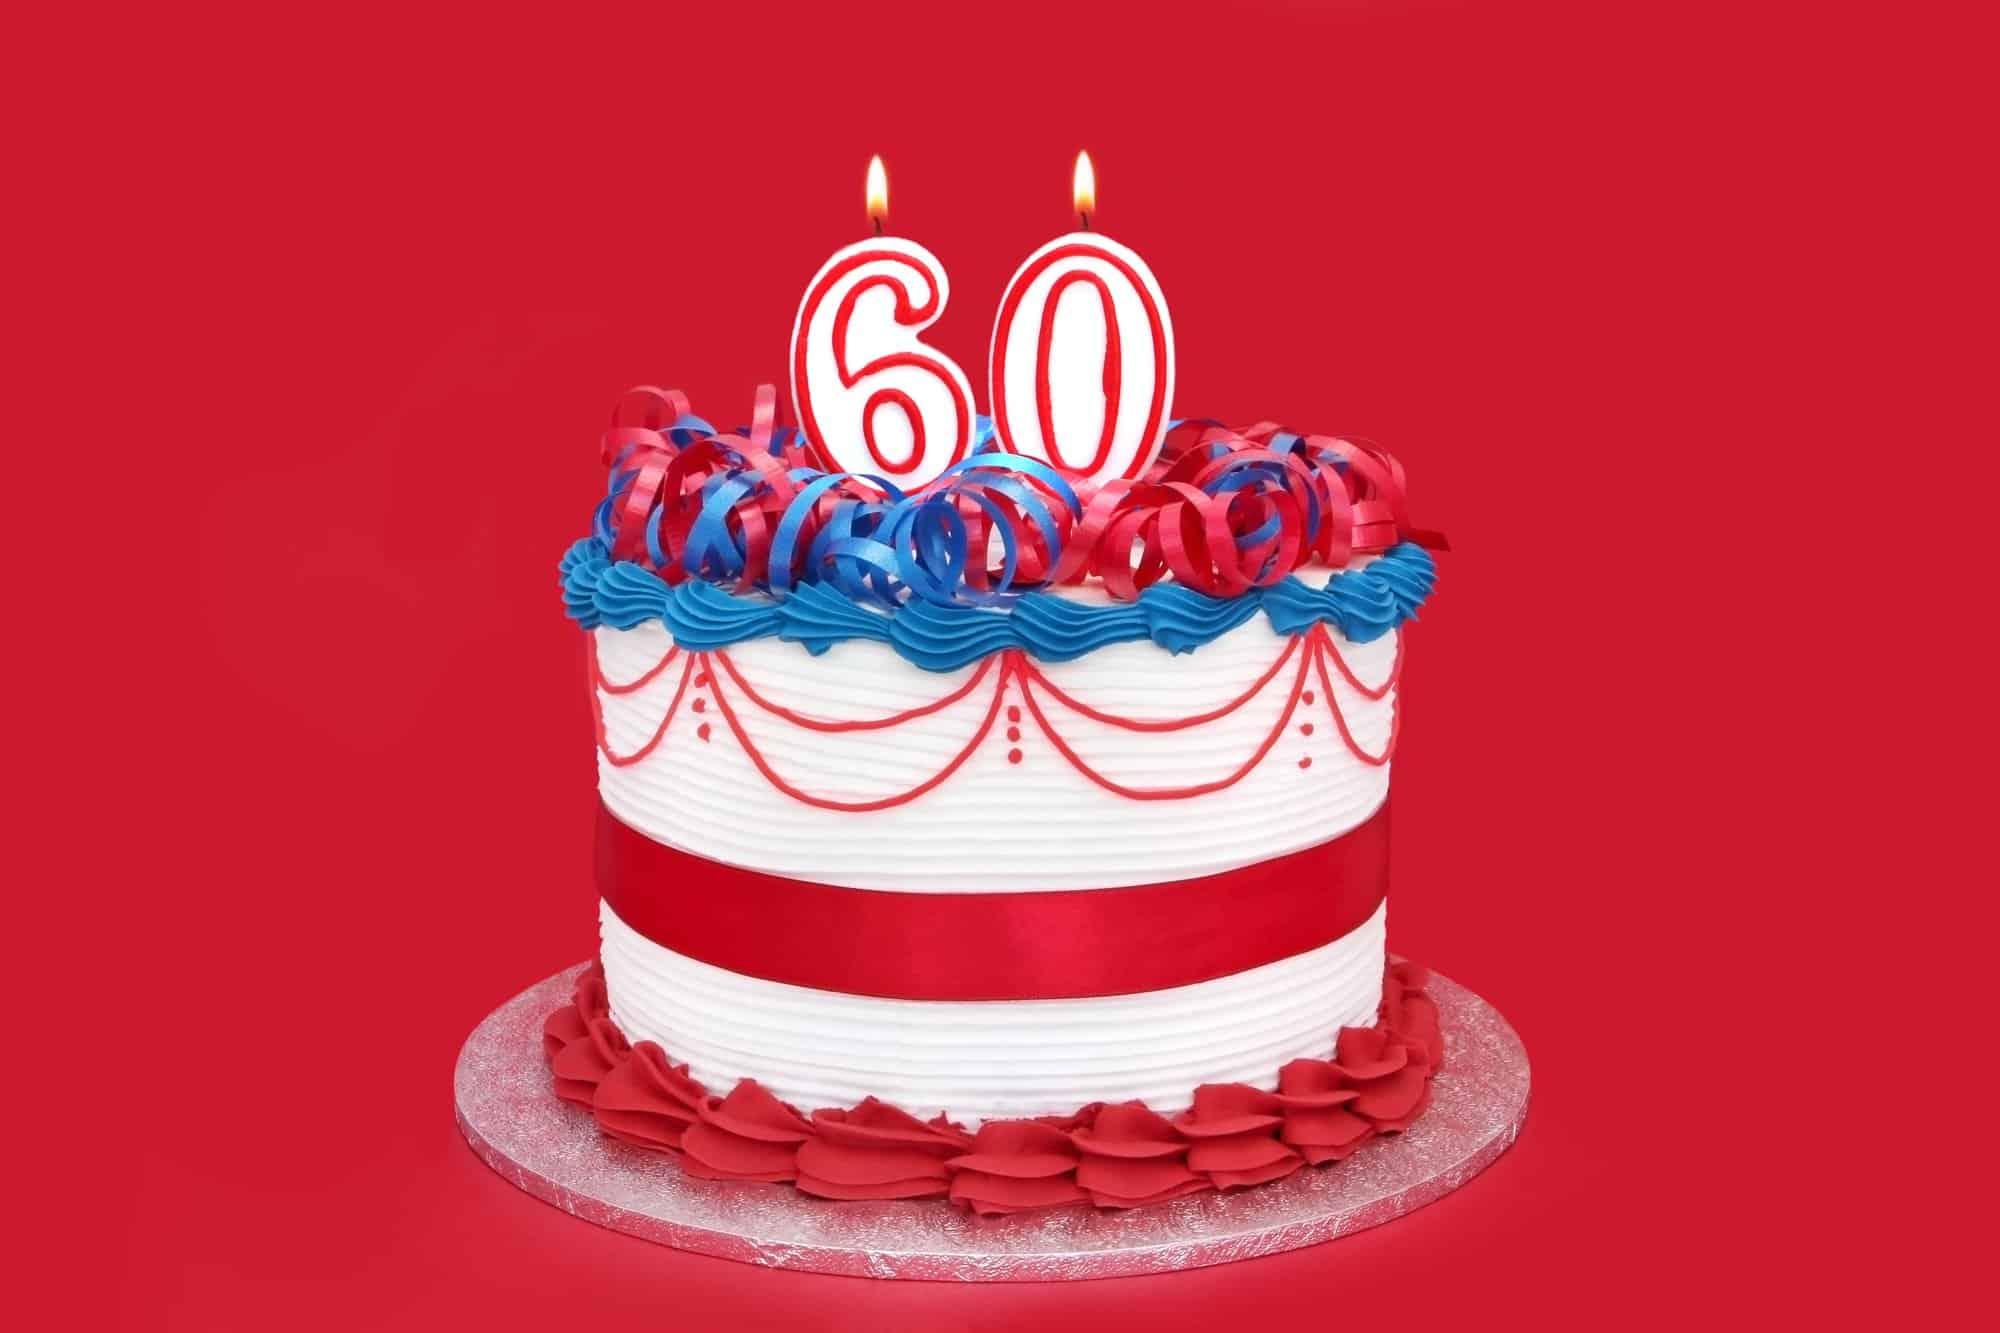 60th birthday invitation wording